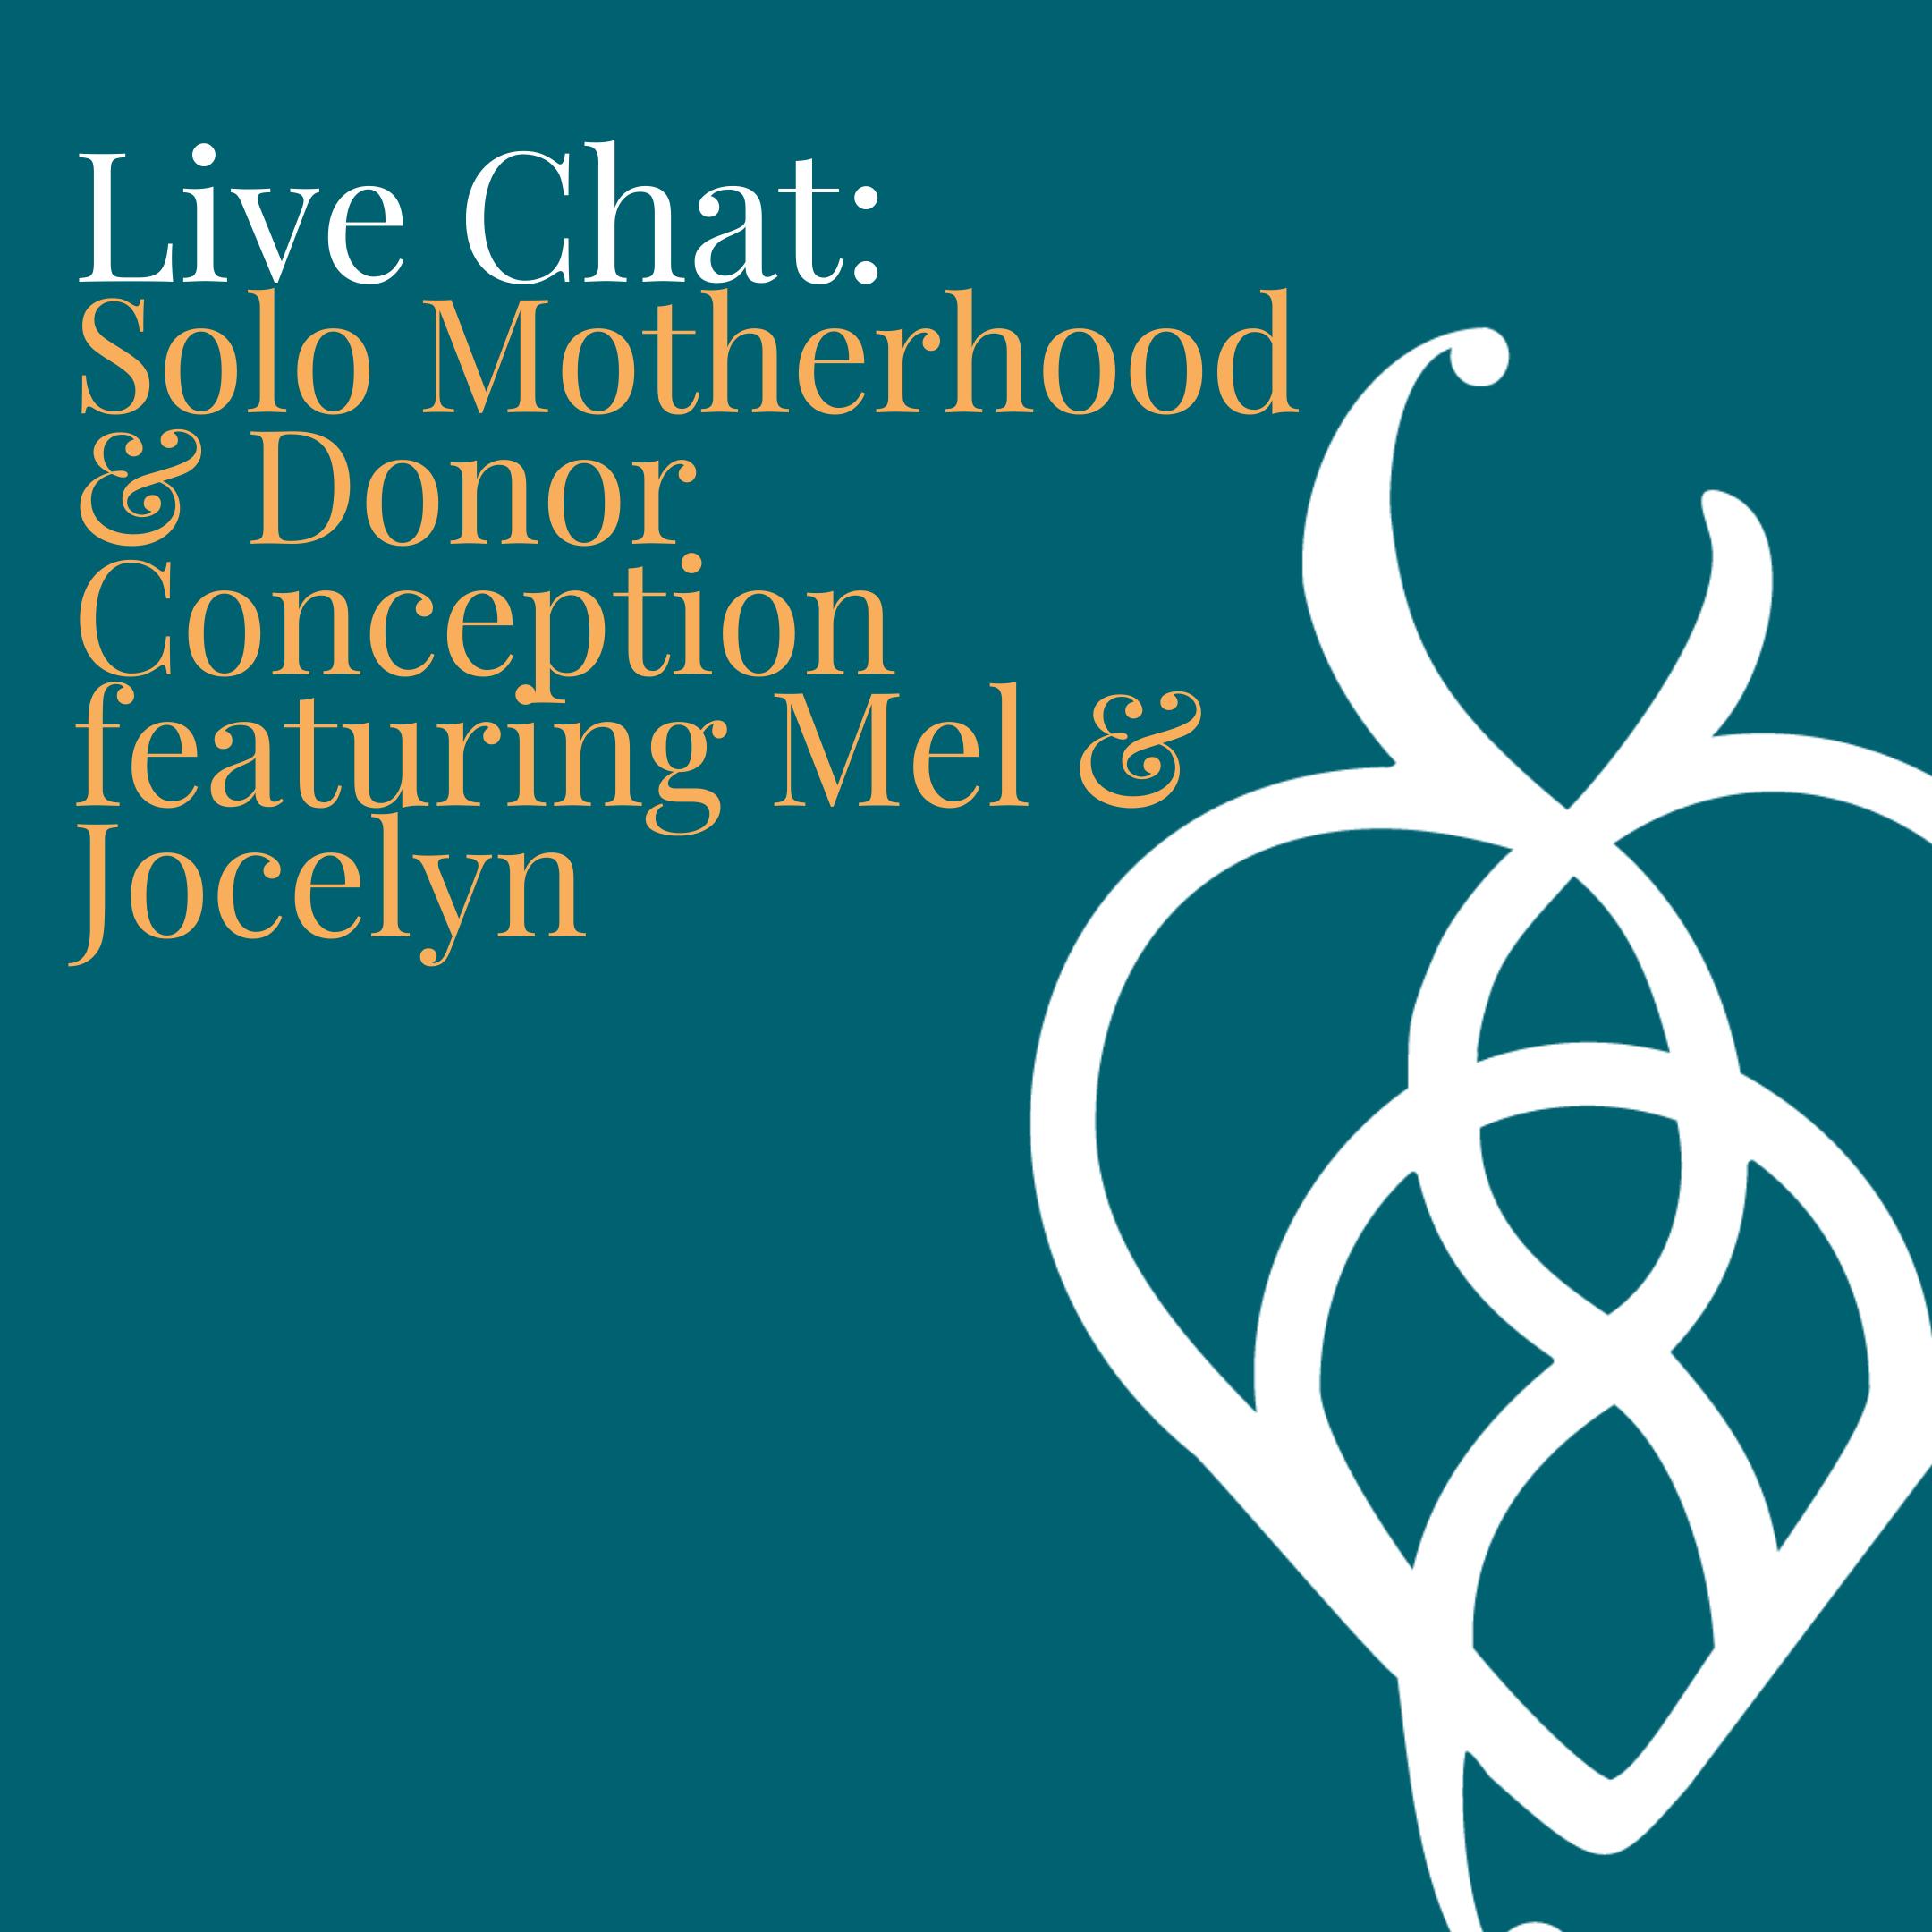 Solo Motherhood & Donor Conception featuring Mel & Jocelyn